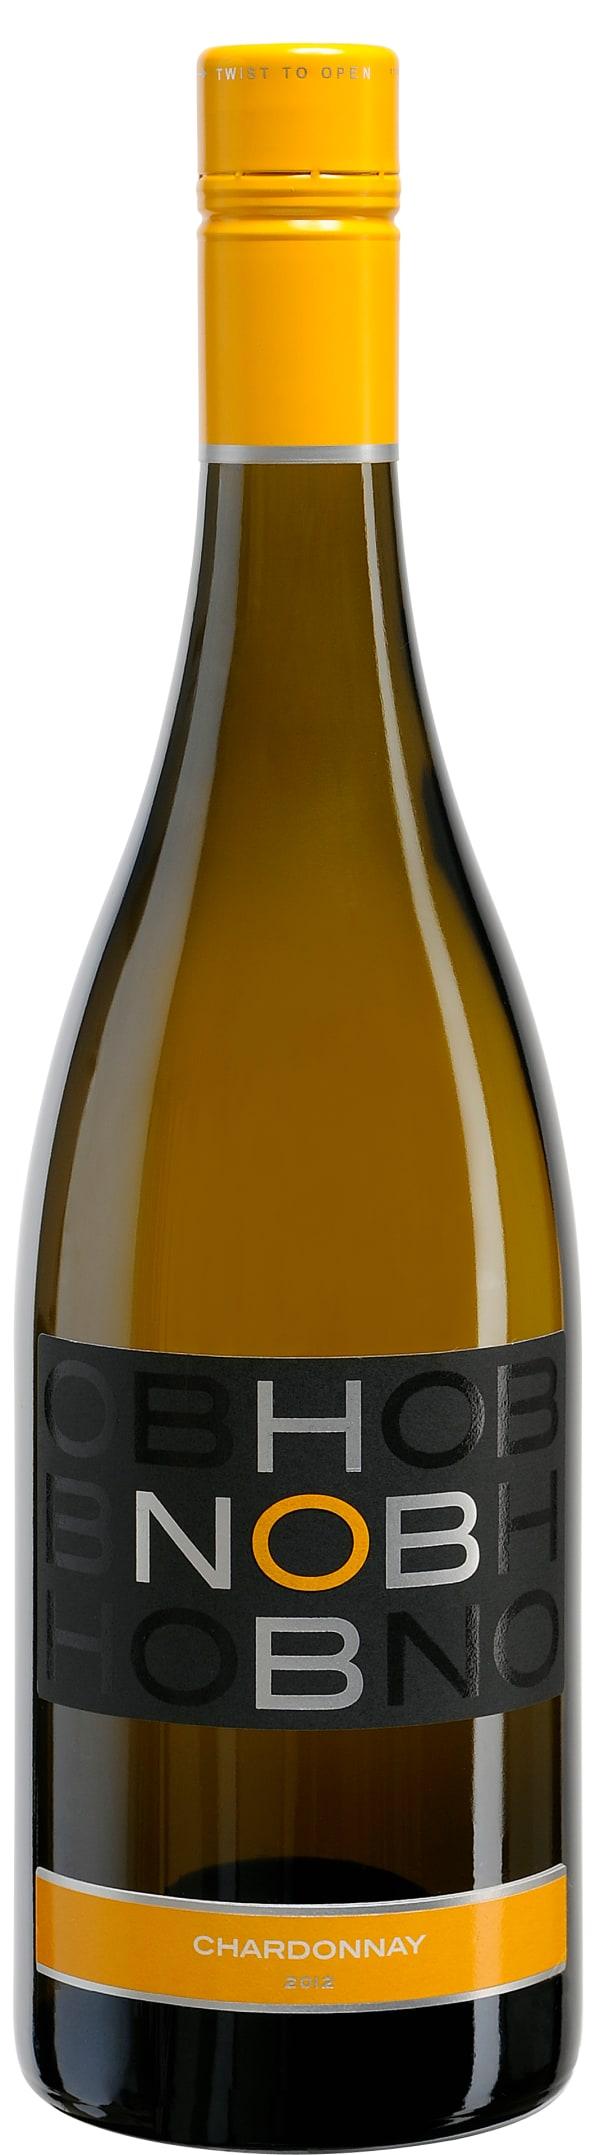 Hob Nob Chardonnay 2019